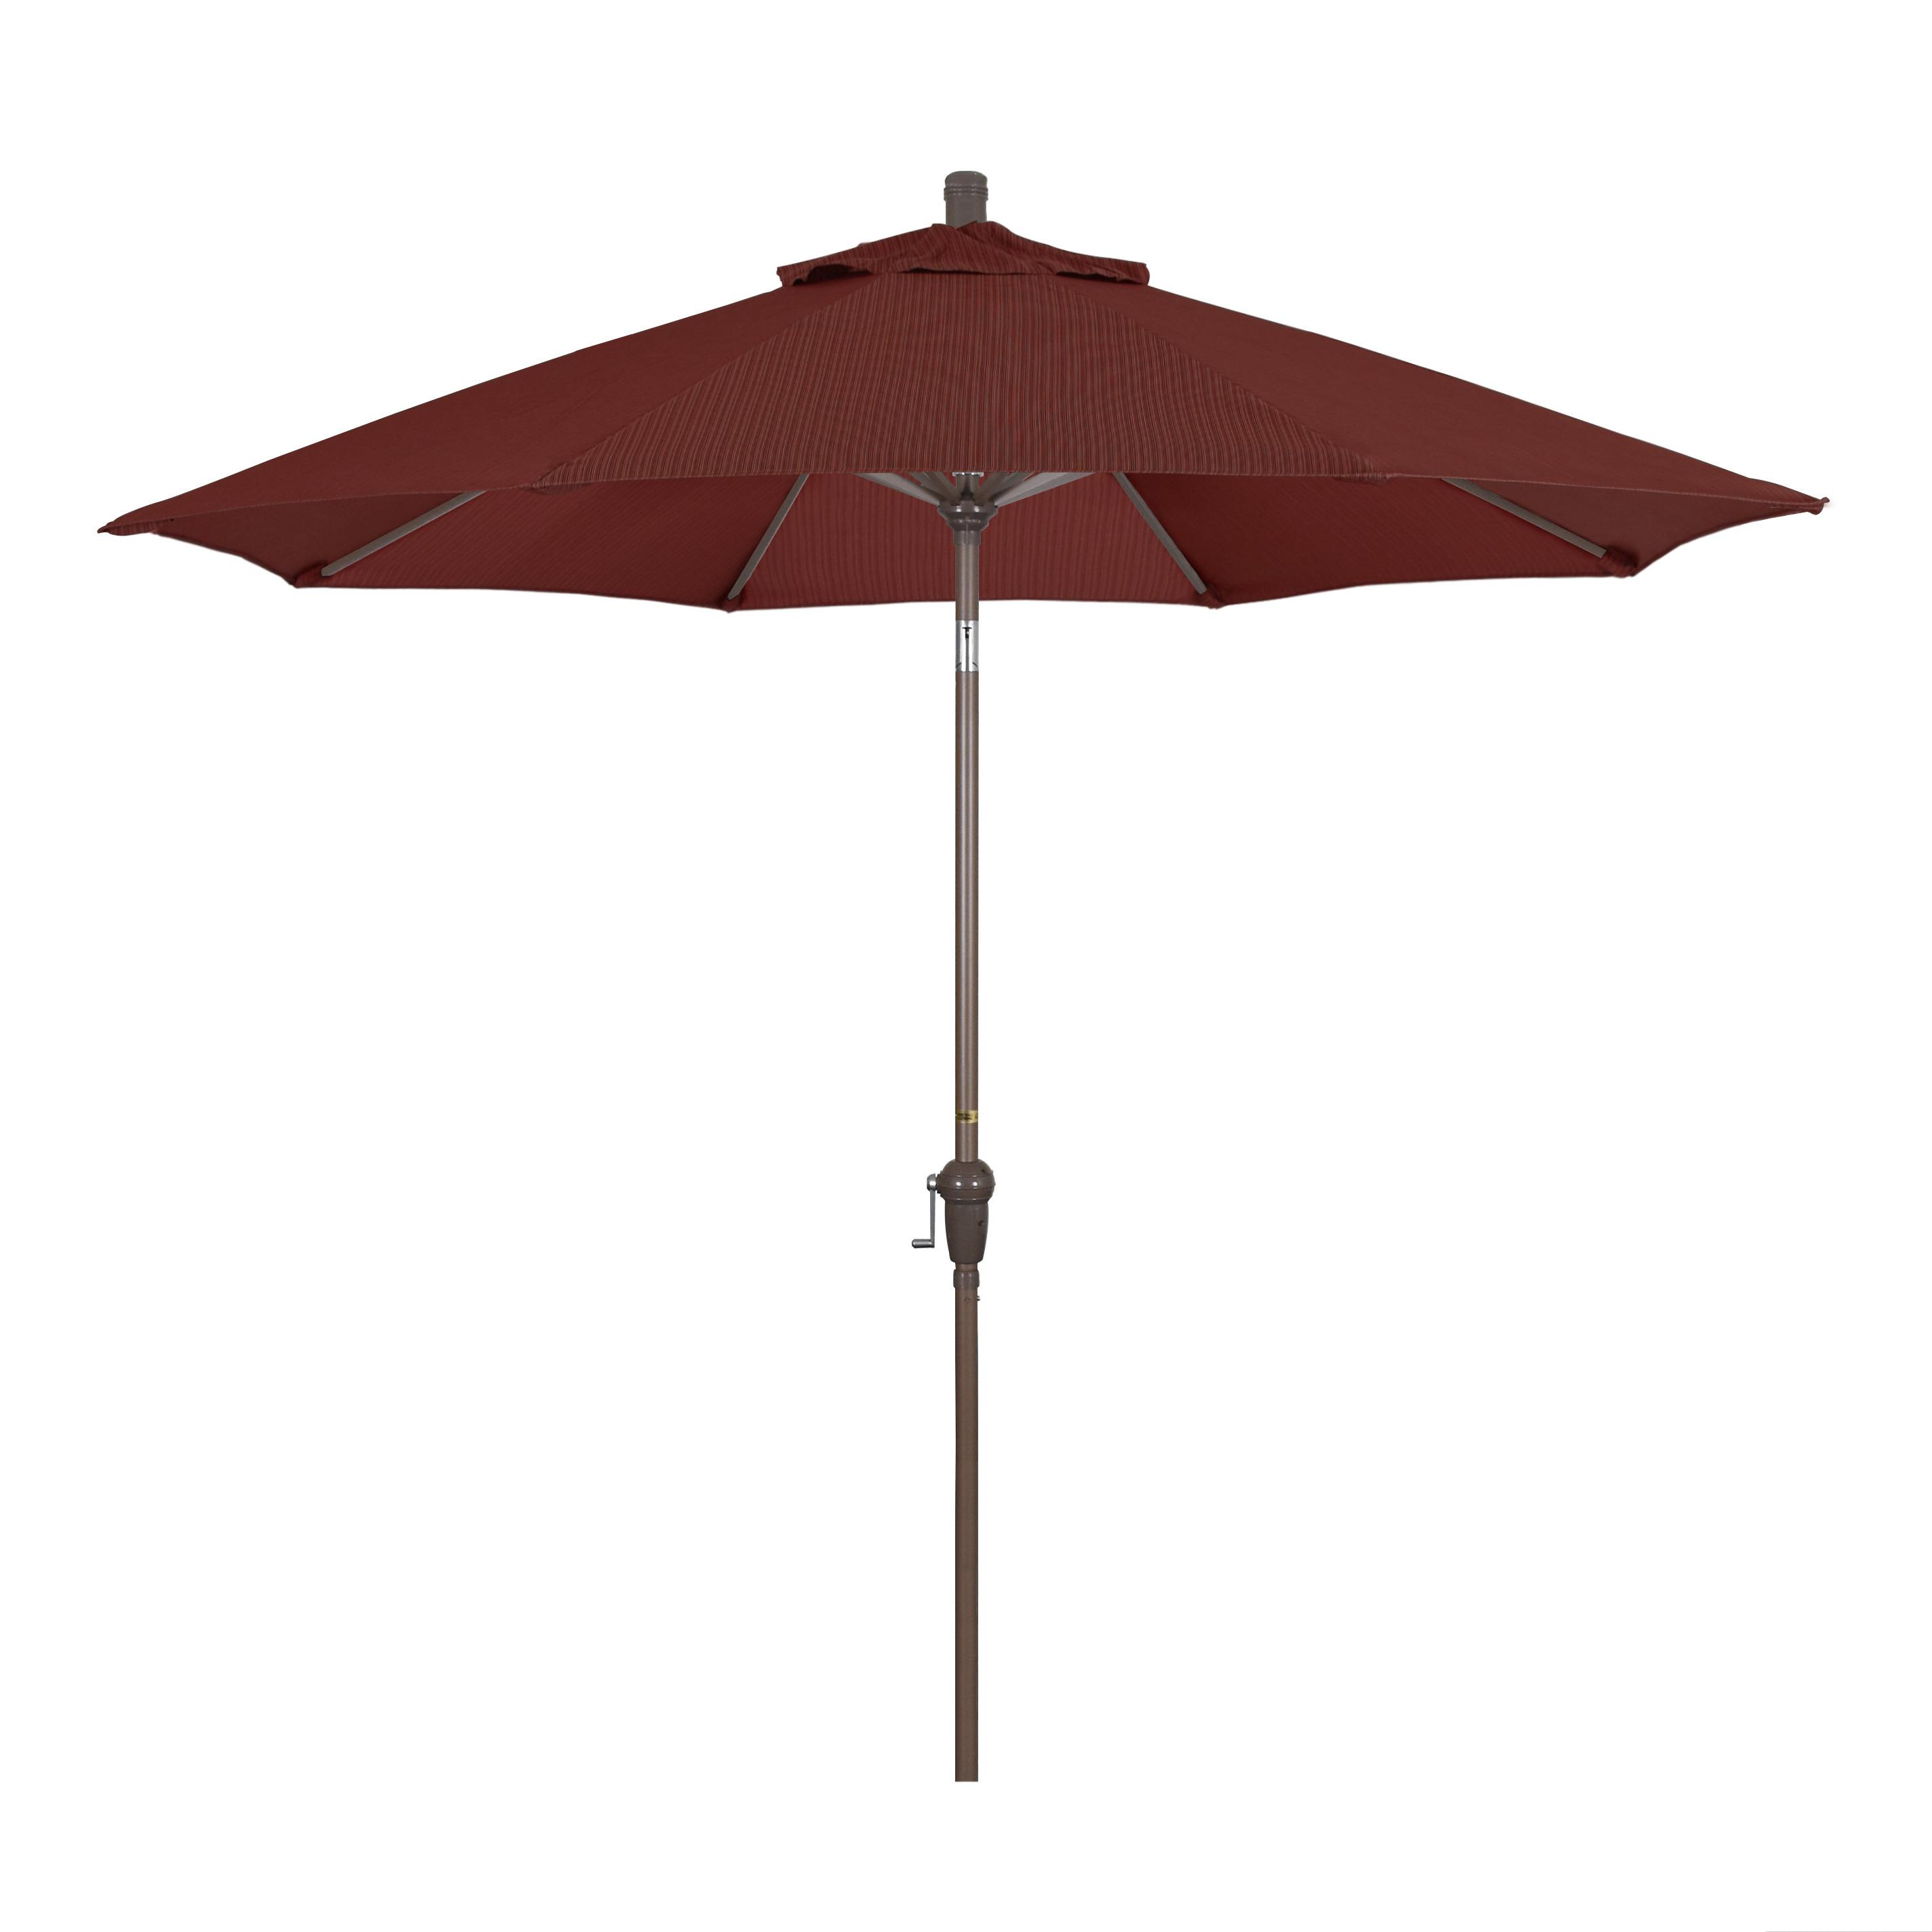 Most Recent Mullaney Market Sunbrella Umbrellas Throughout Mullaney 9' Market Umbrella (View 3 of 20)